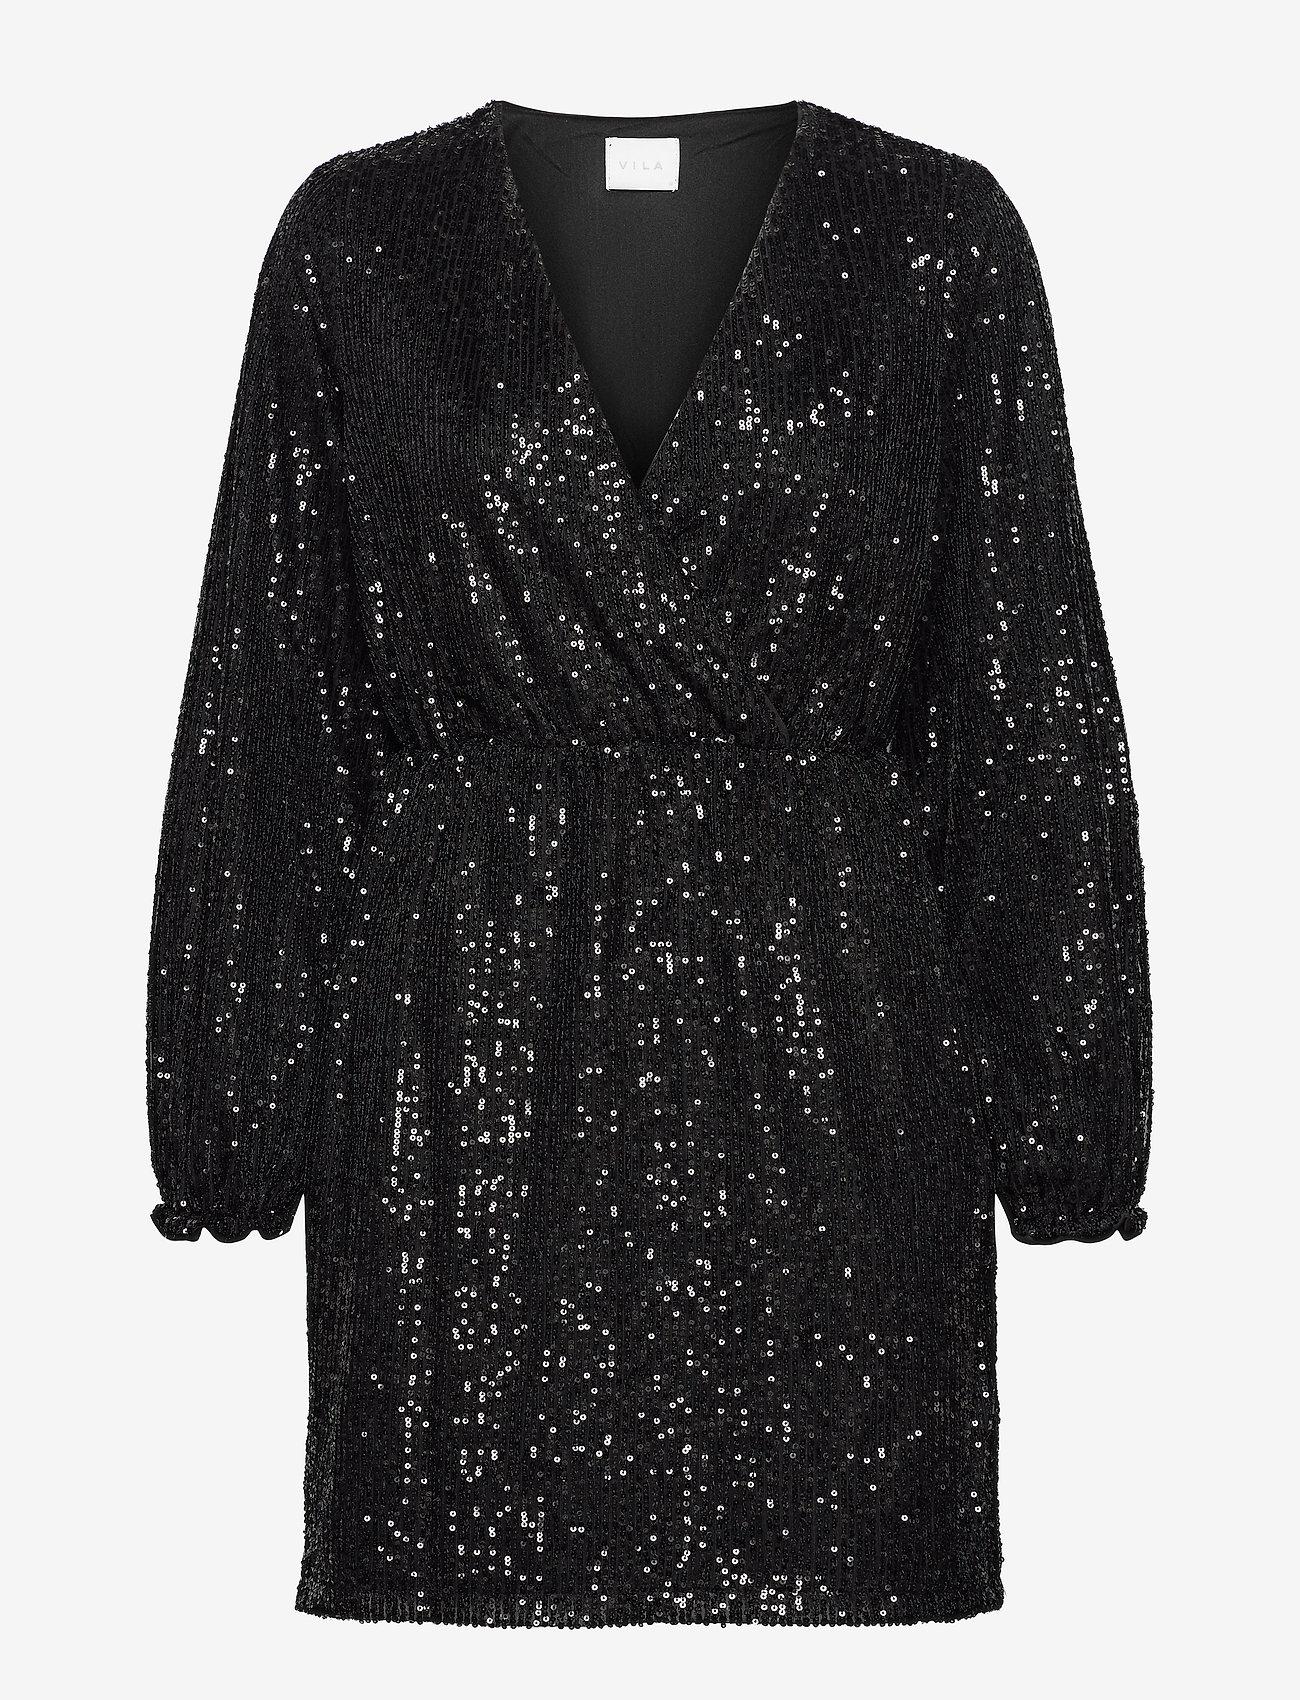 Vila - VILYC L/S SHORT DRESS - paljettkjoler - black - 0